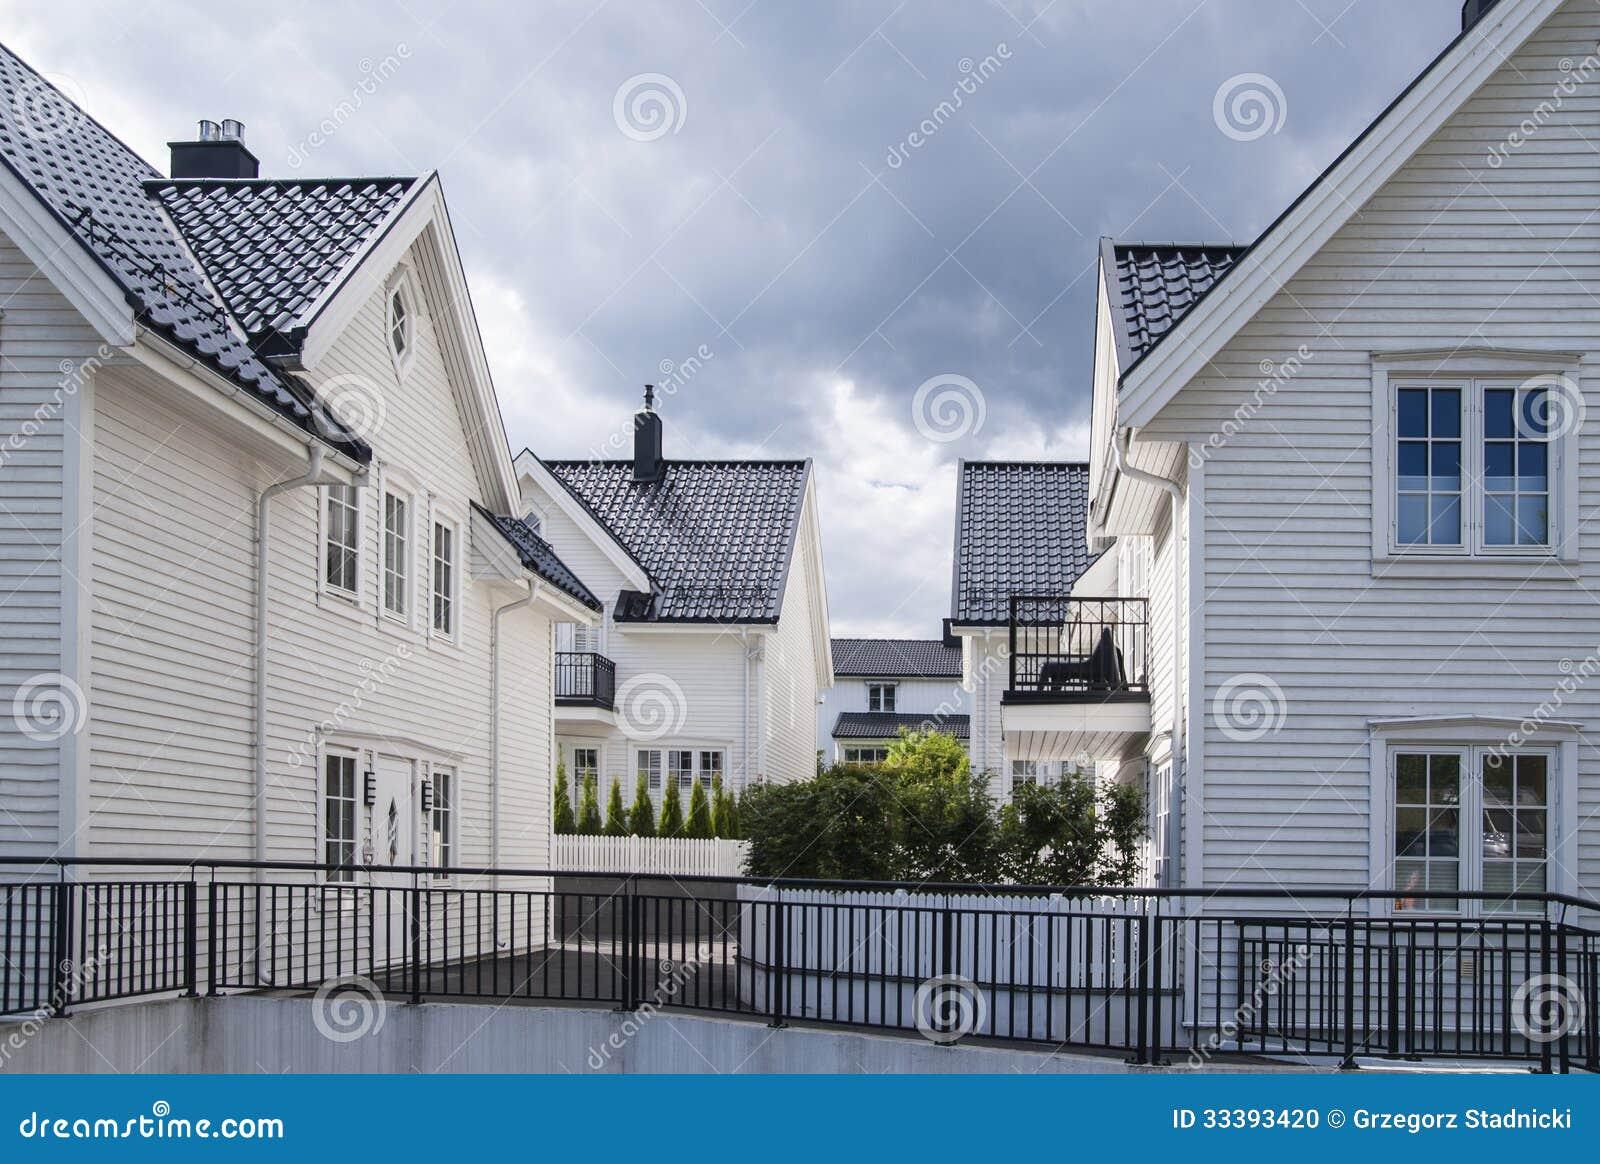 Case scandinave fotografia stock immagine di montante - Casas escandinavas ...